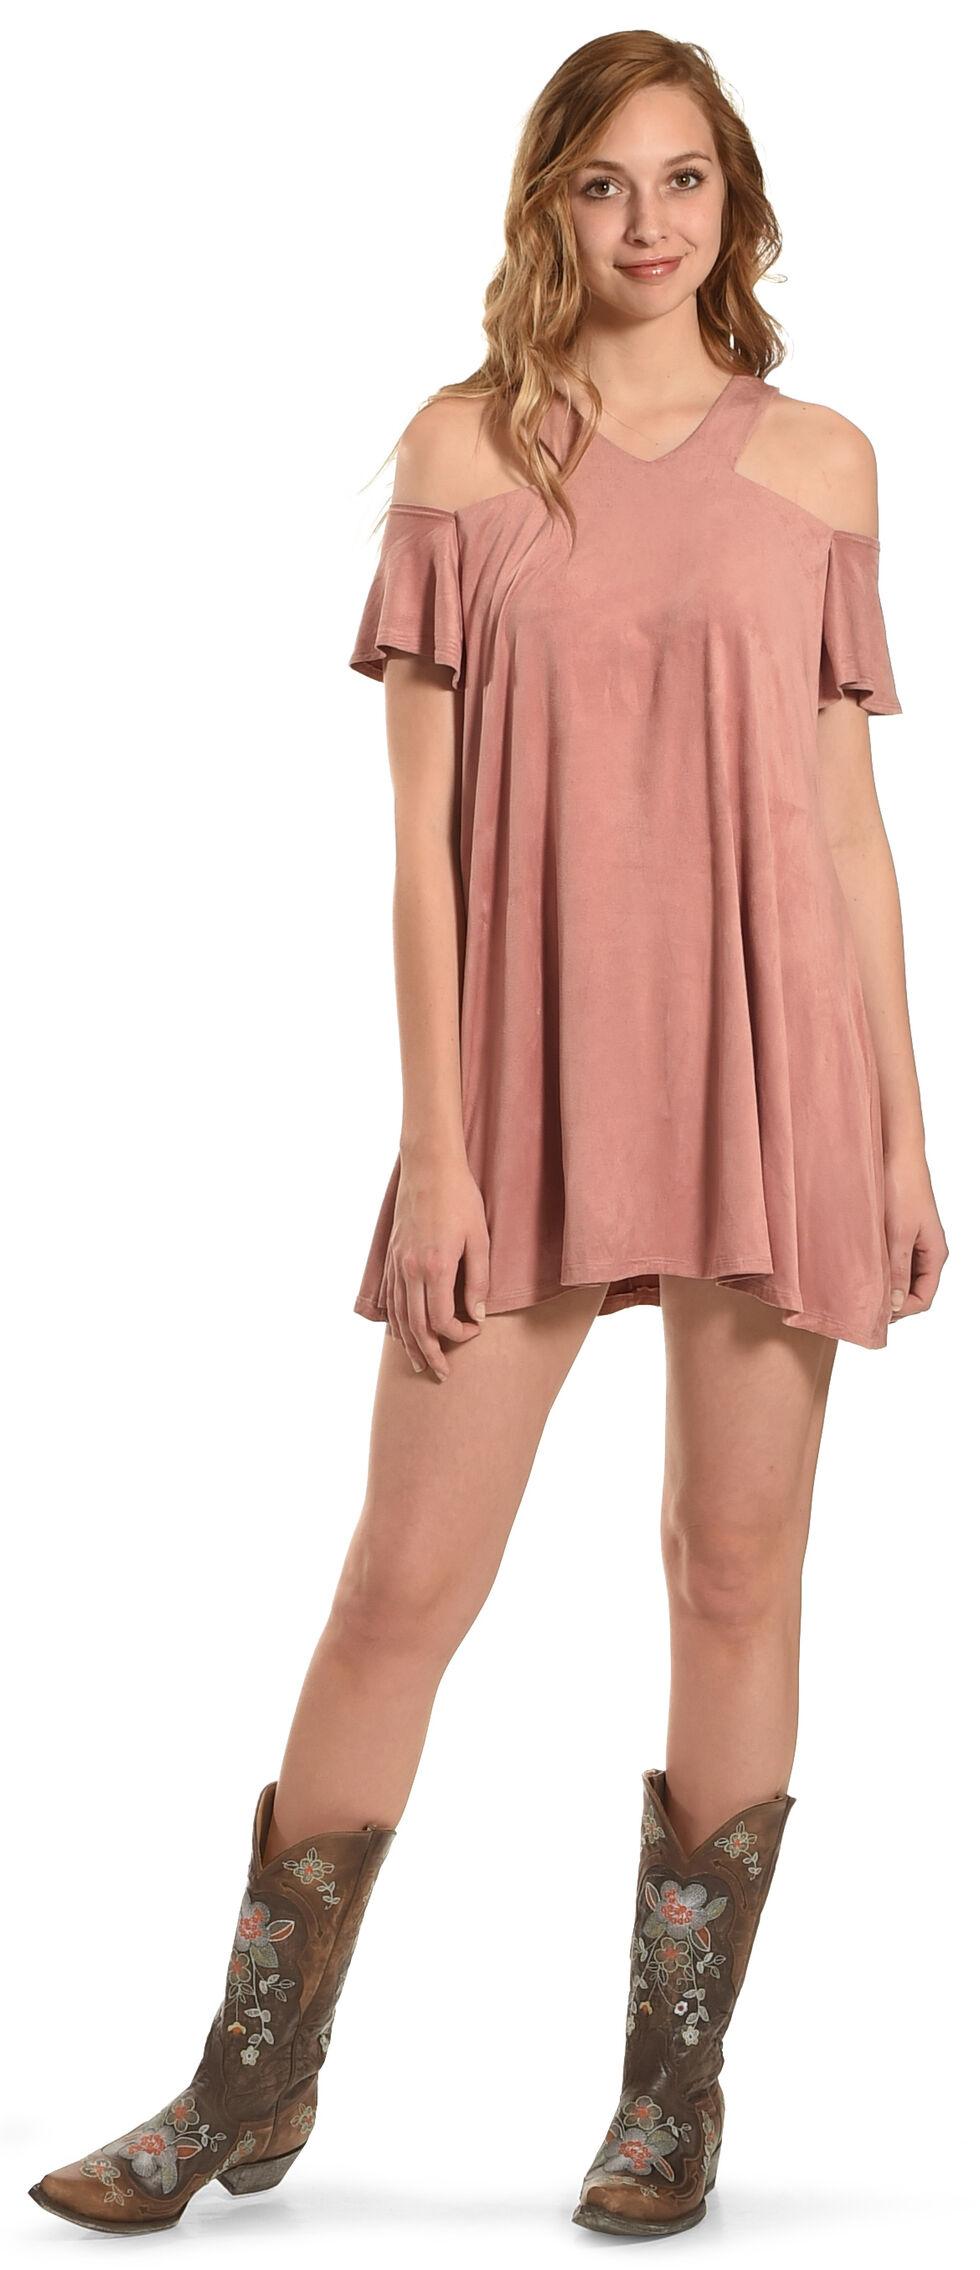 Jody of California Women's Pink Cold Shoulder Micro Suede Dress , Pink, hi-res